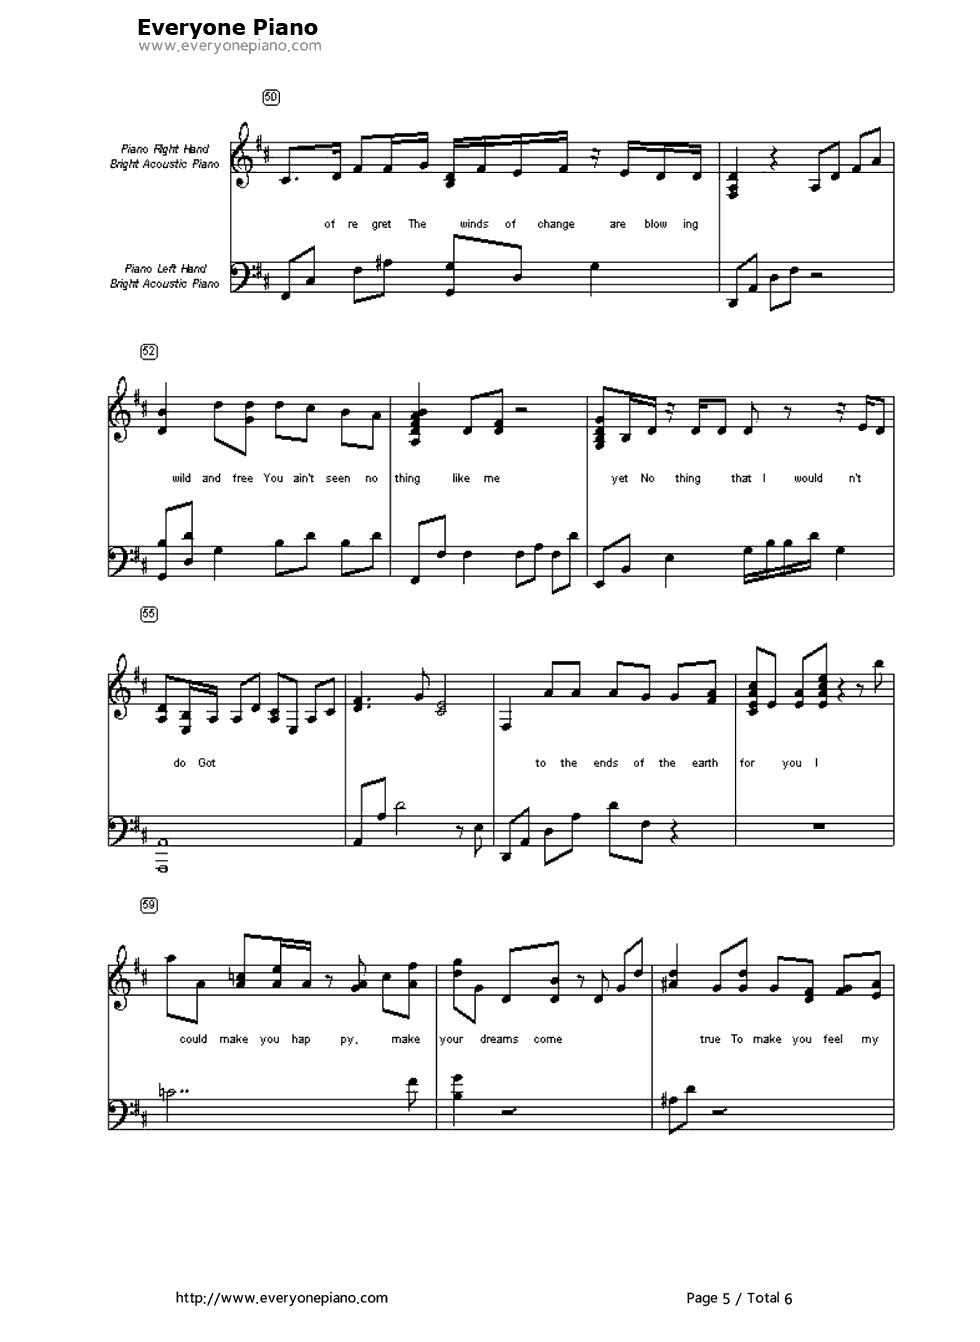 Make You Feel My Love Chords To Make You Feel My Love Garth Brooks Free Piano Sheet Music Piano